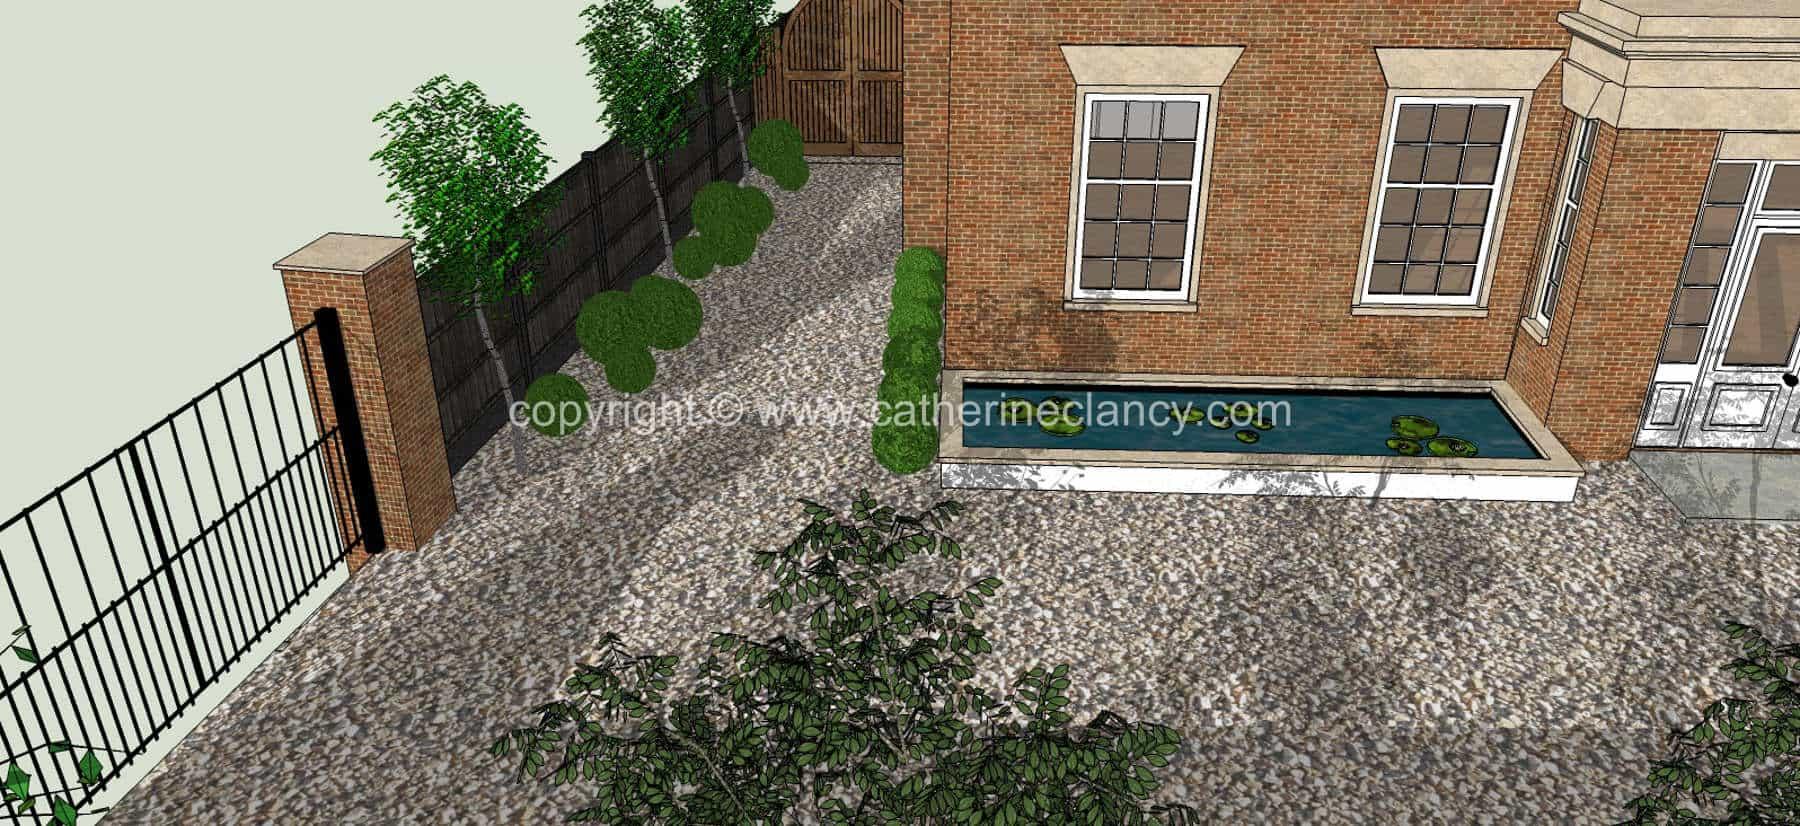 hendon-grand-design-garden-13